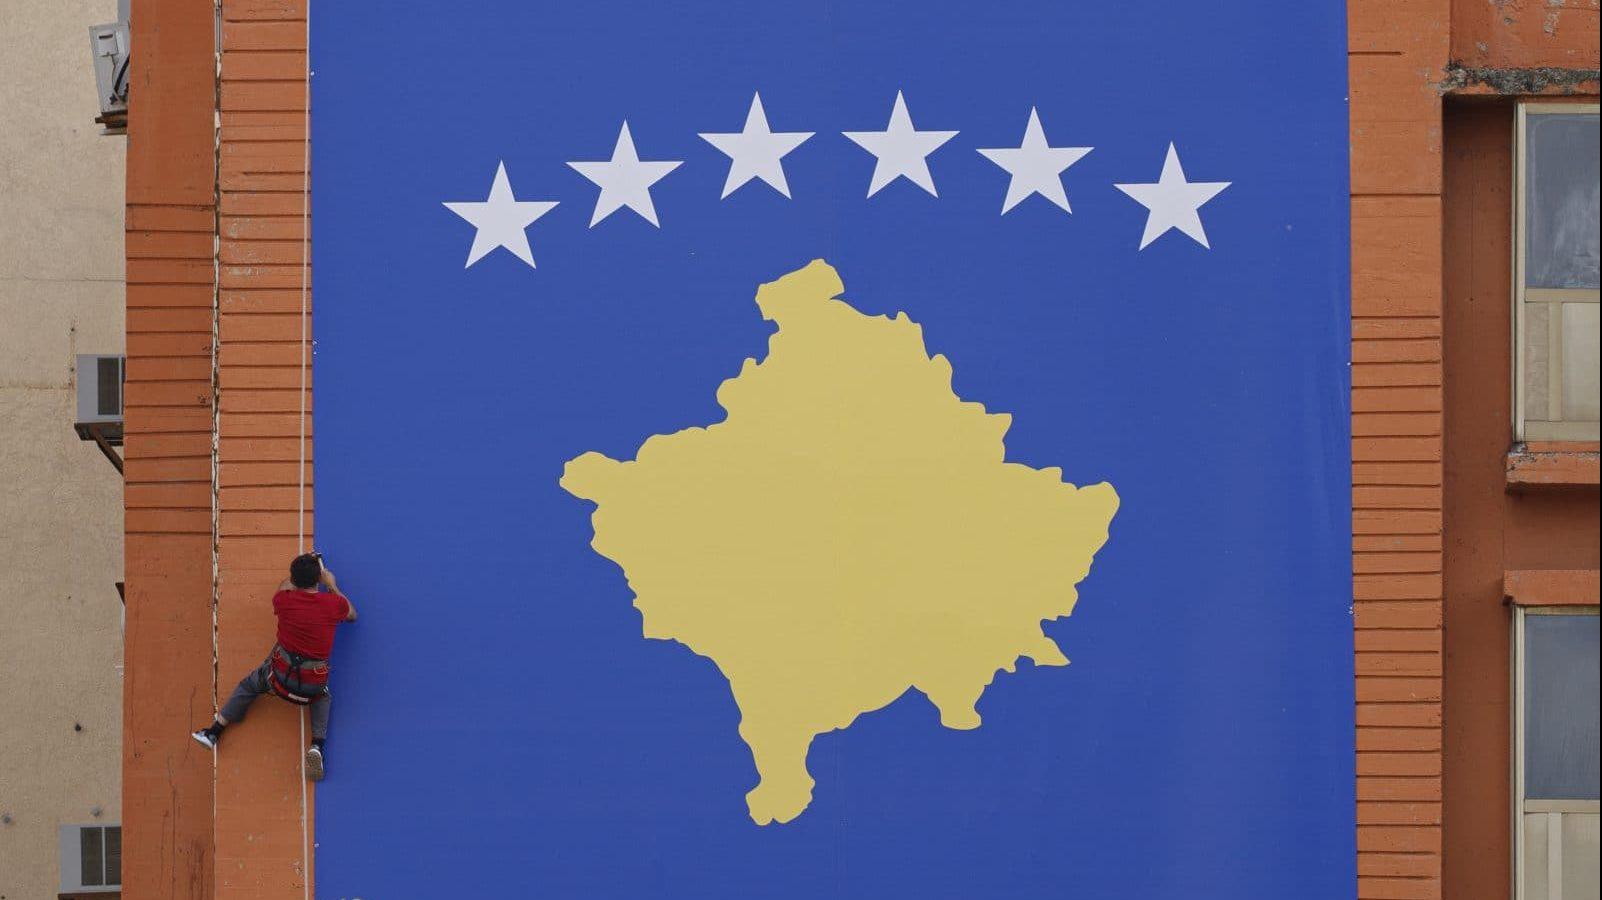 Field Missing: Discrepancies and Gaps Plague Kosovo's Public Data